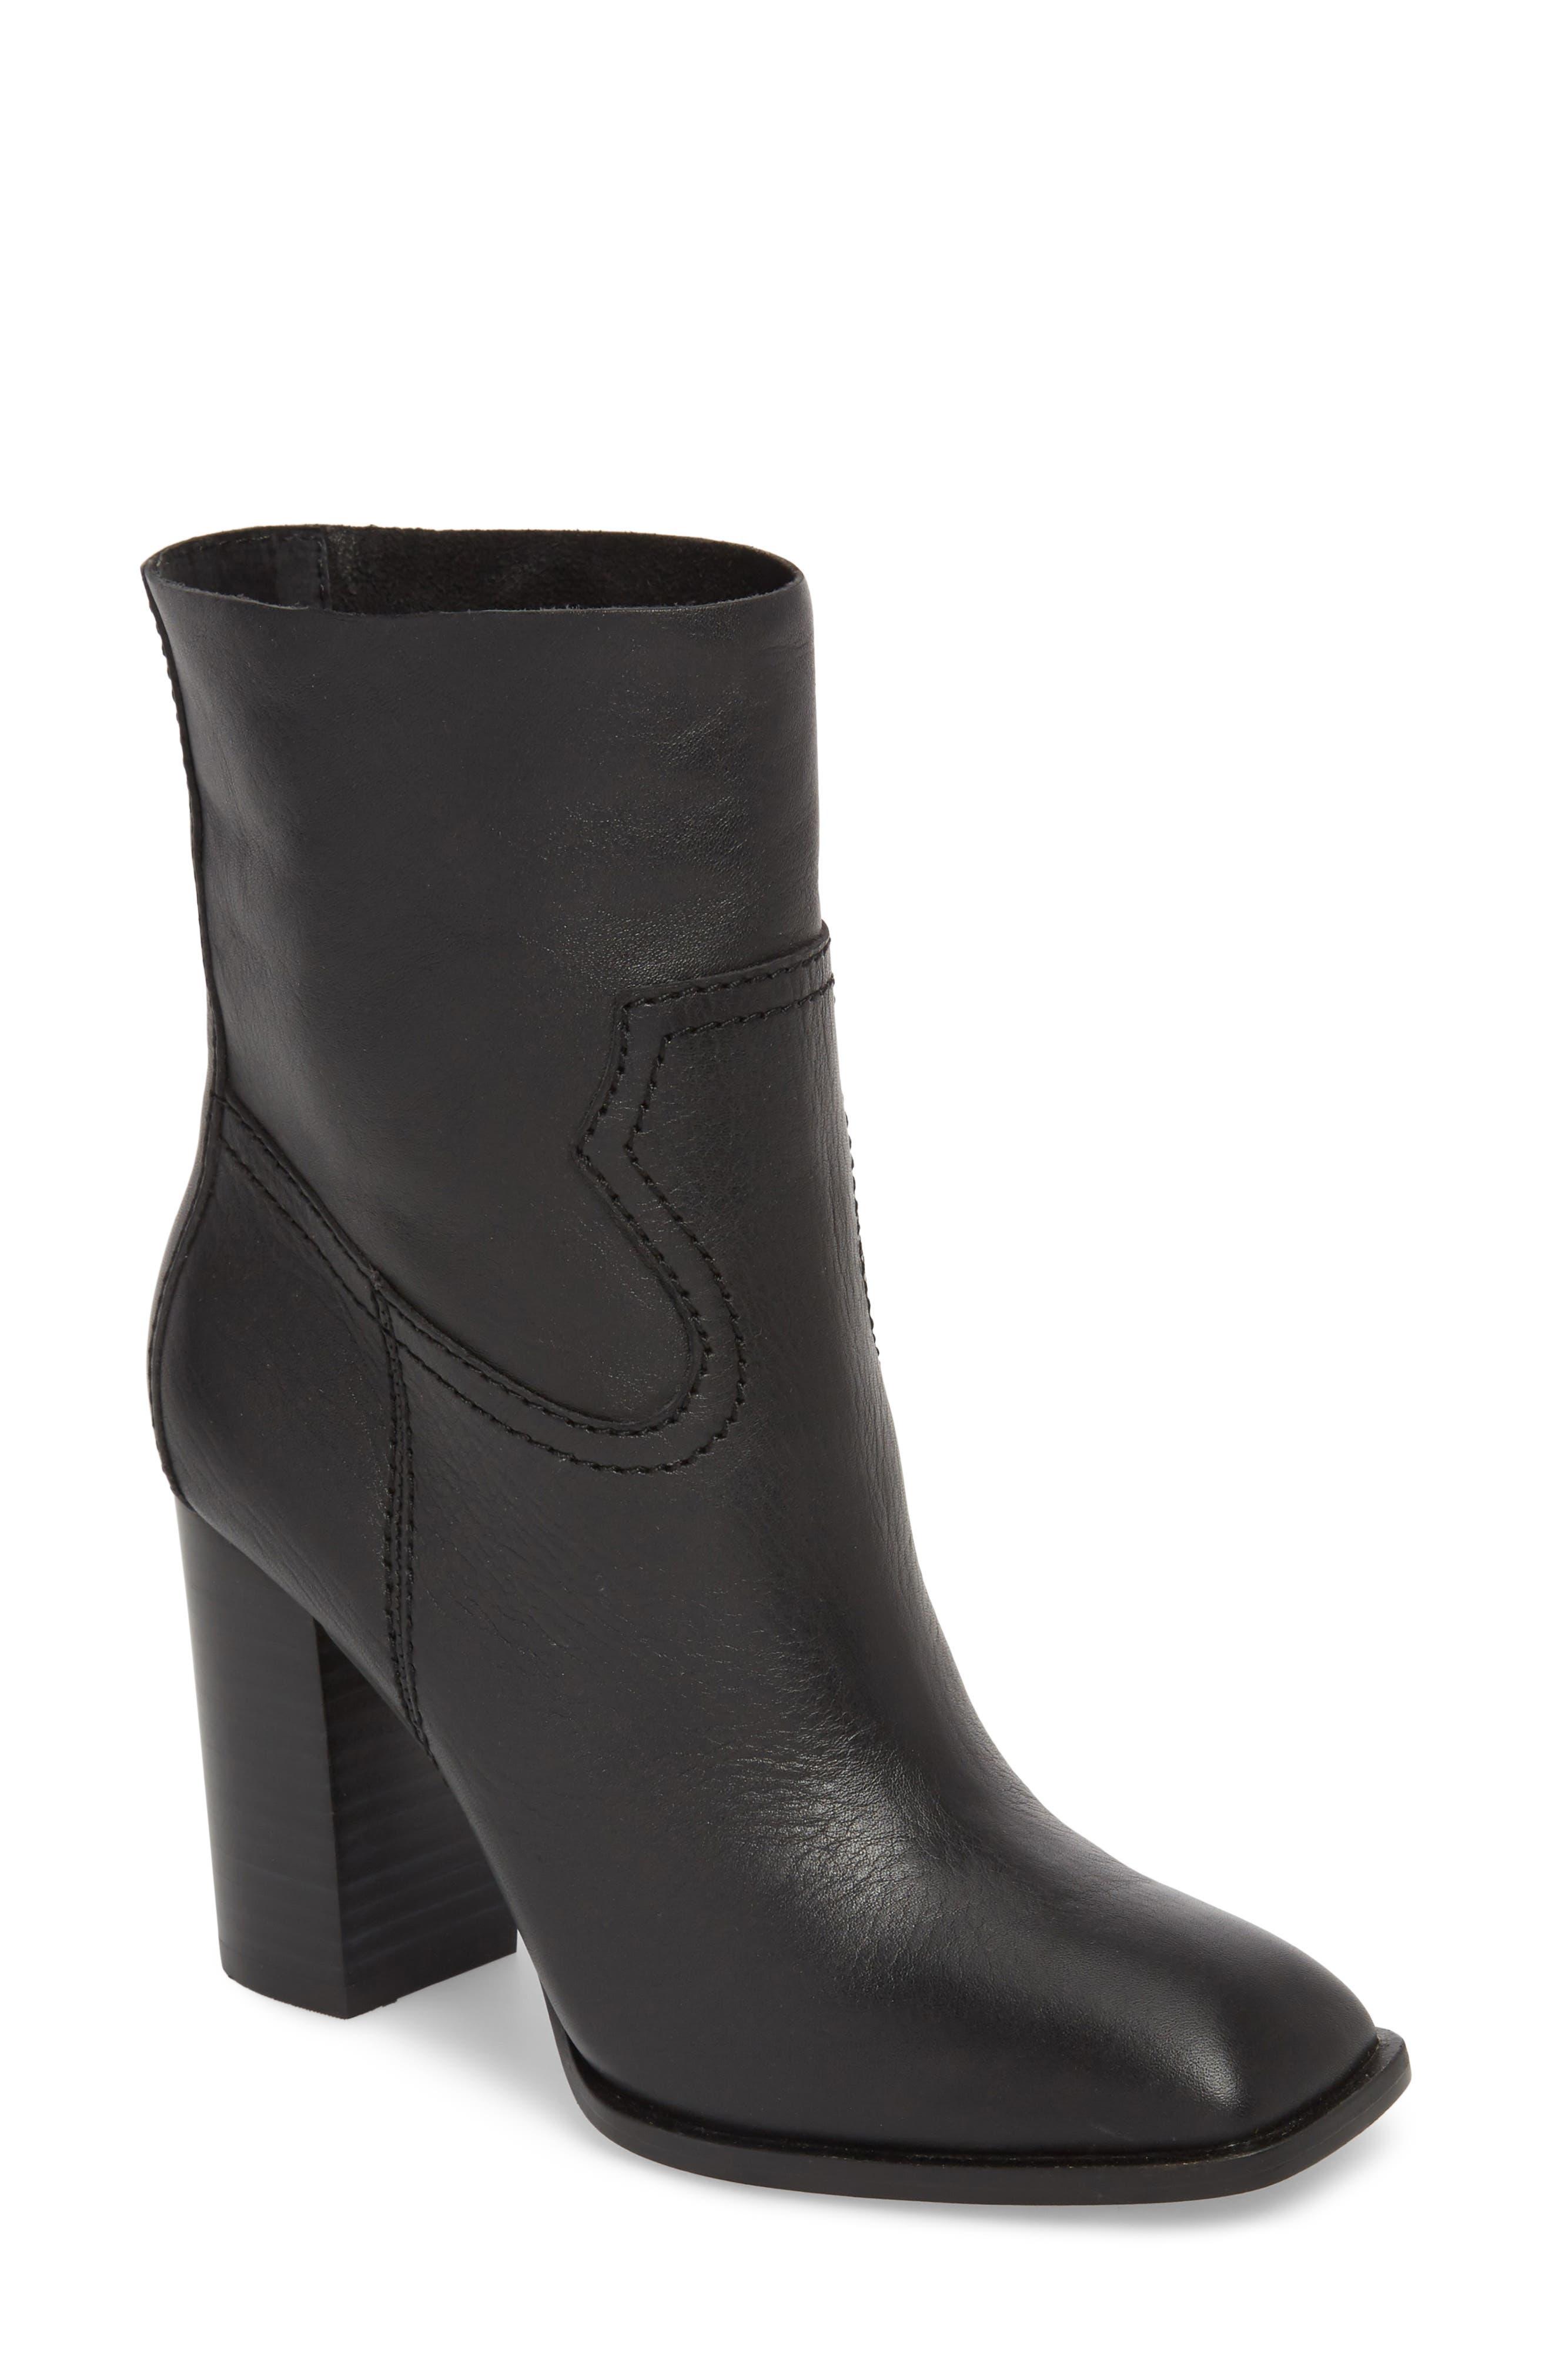 Nero Bootie,                         Main,                         color, Black Leather